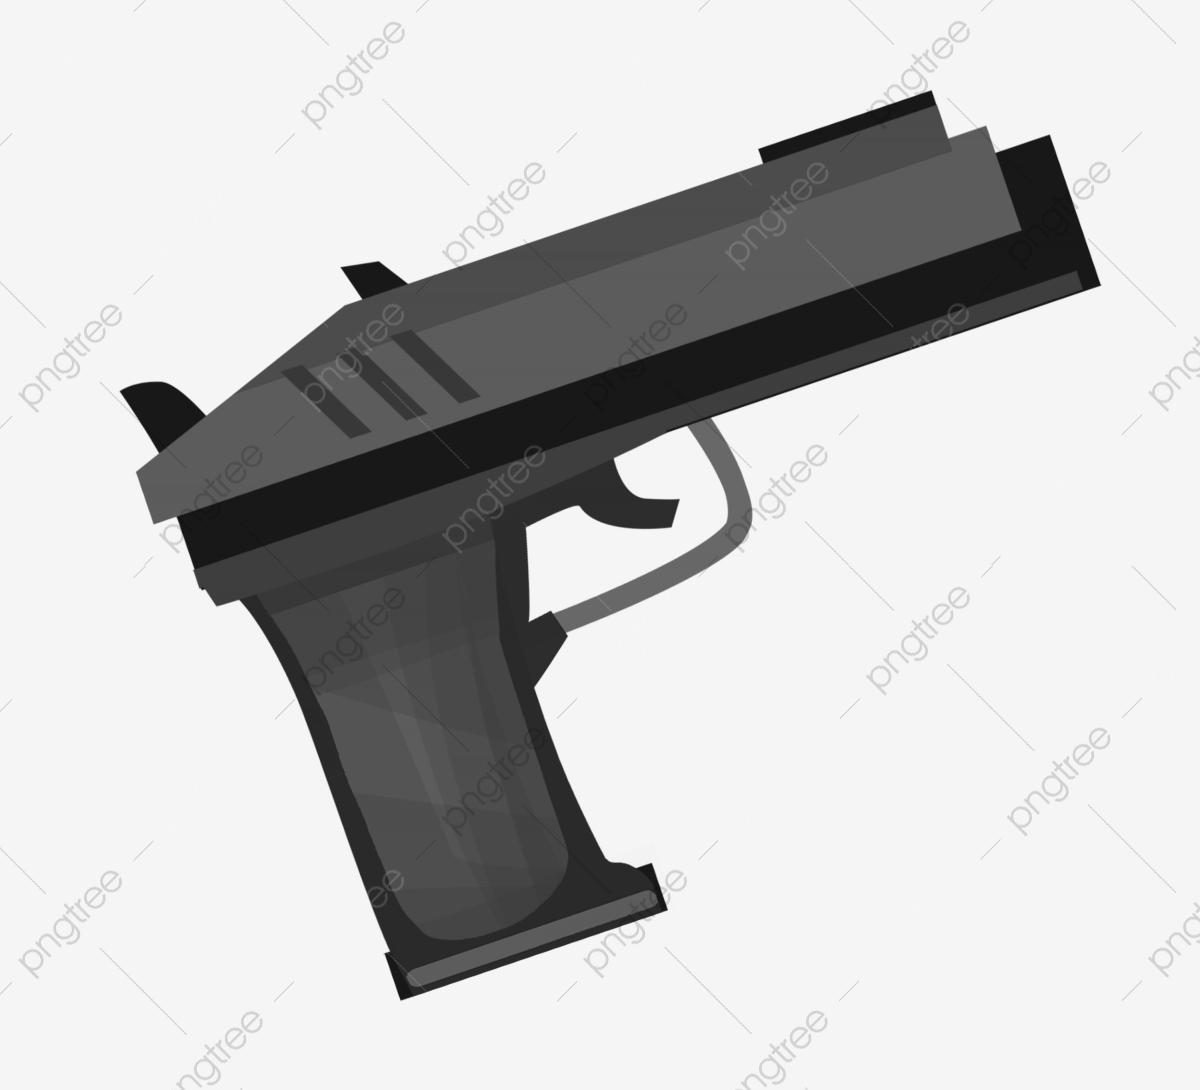 Guns Clipart Border - Gun Png Clipart Transparent PNG - 600x336 - Free  Download on NicePNG